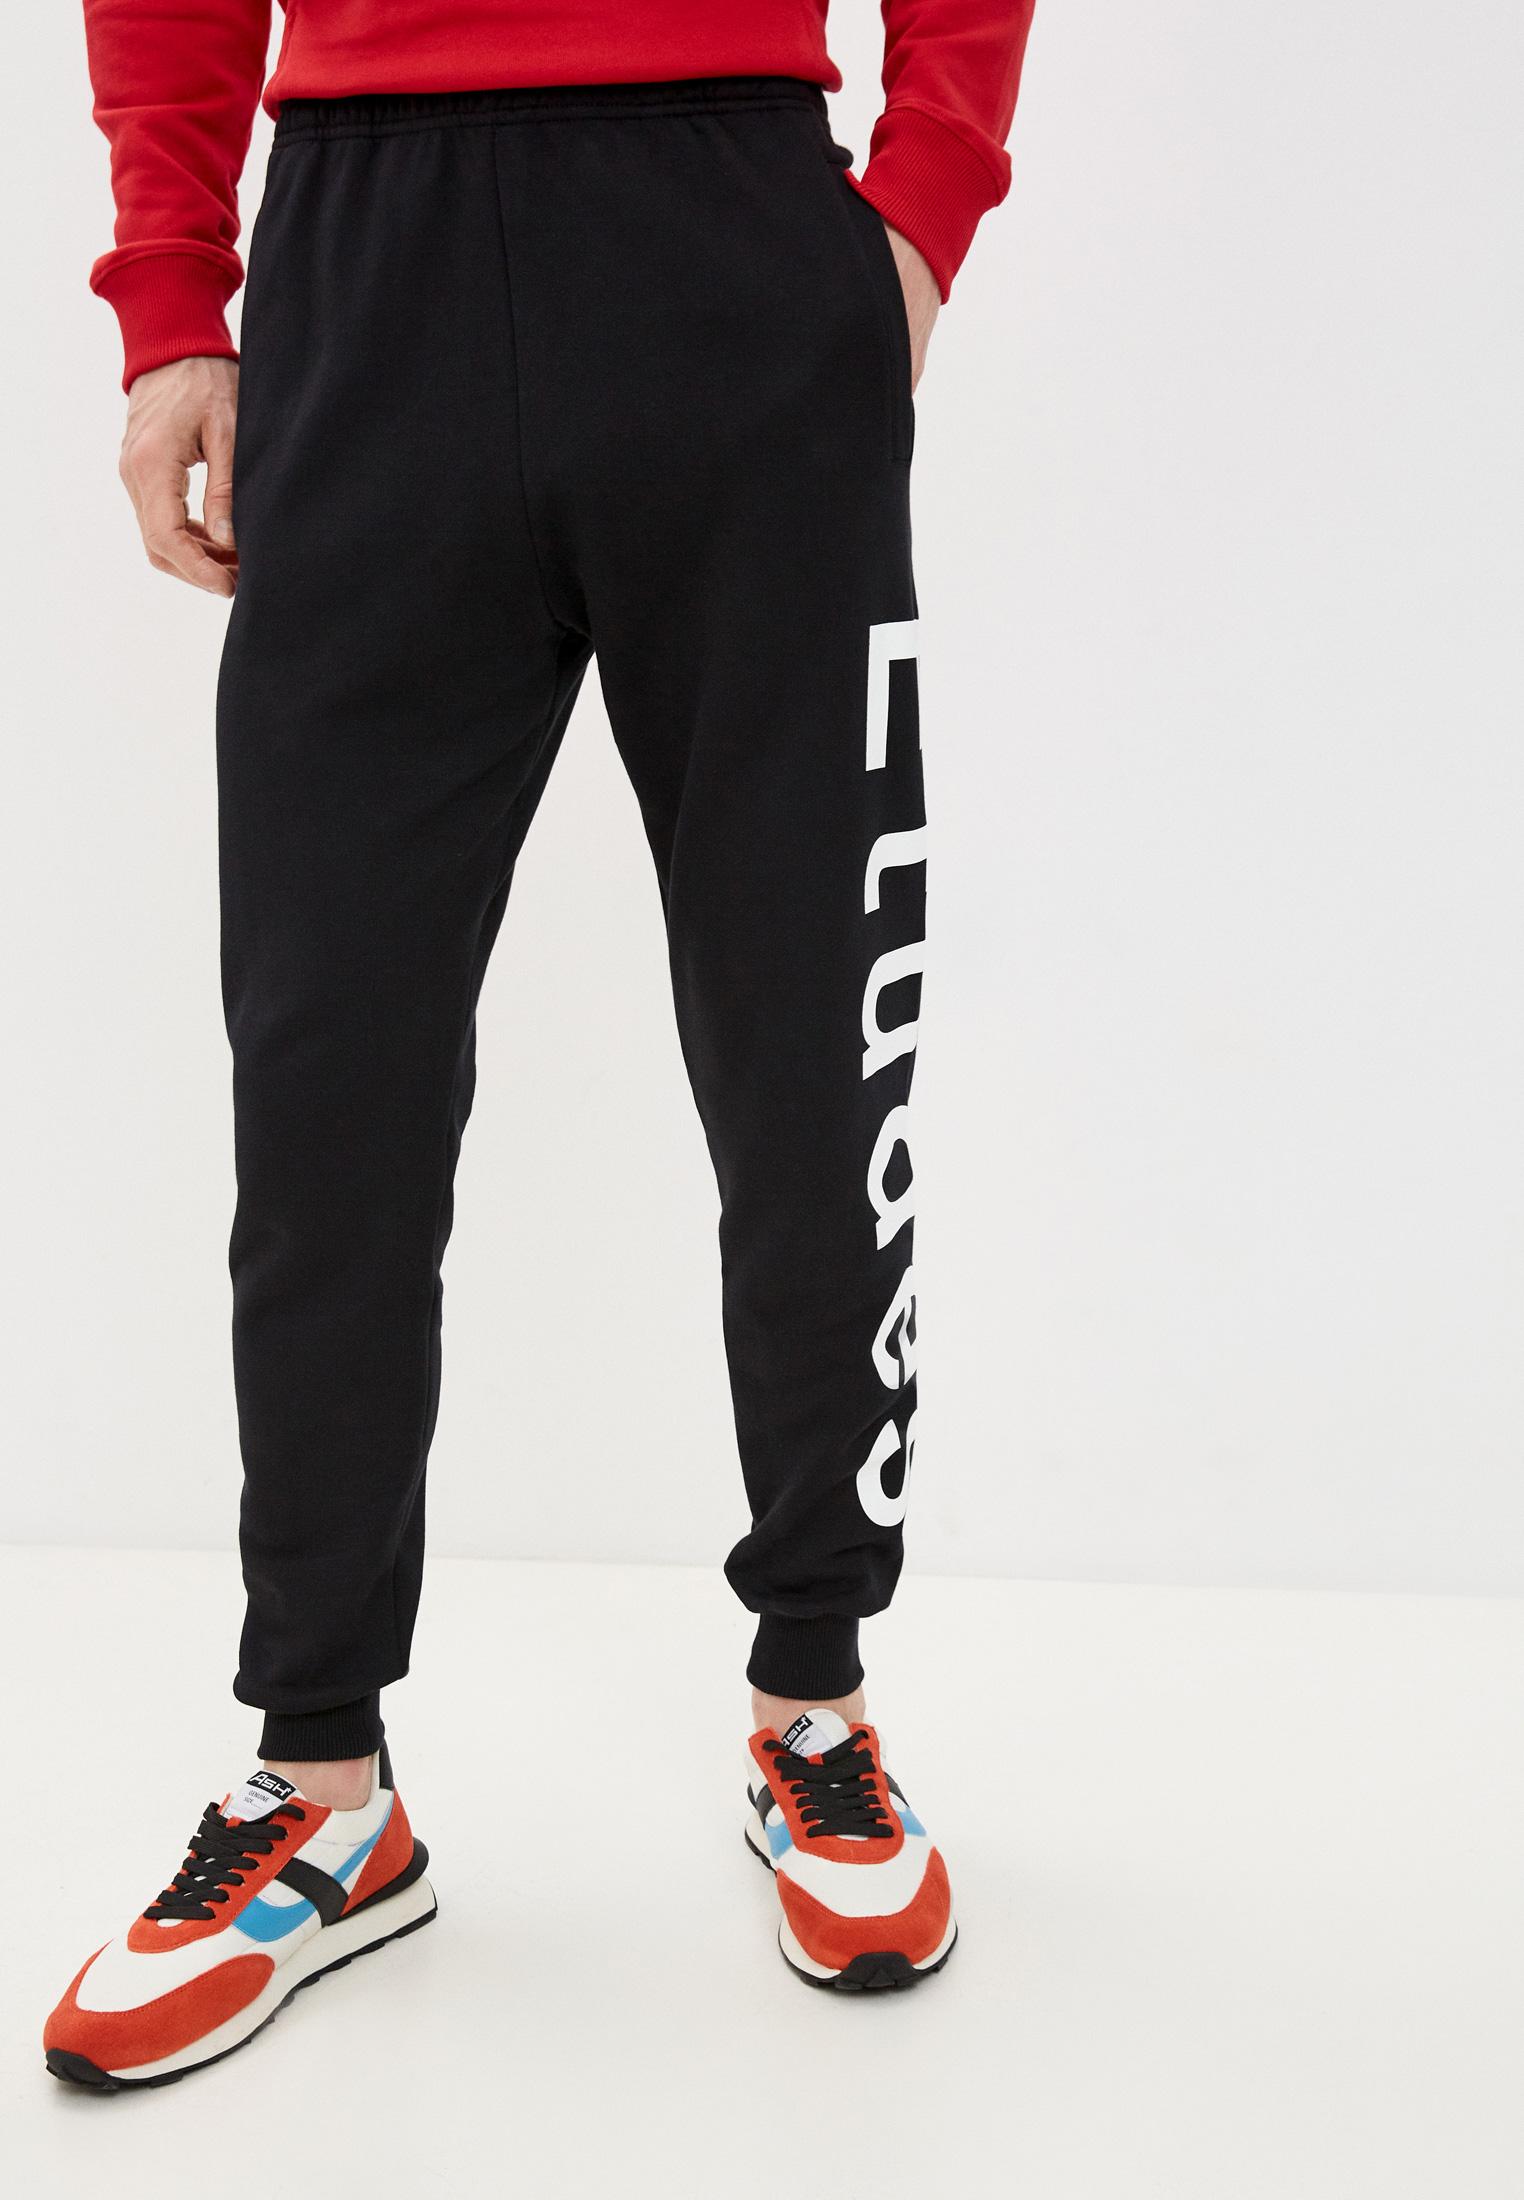 Мужские спортивные брюки Etudes E18E-601-01